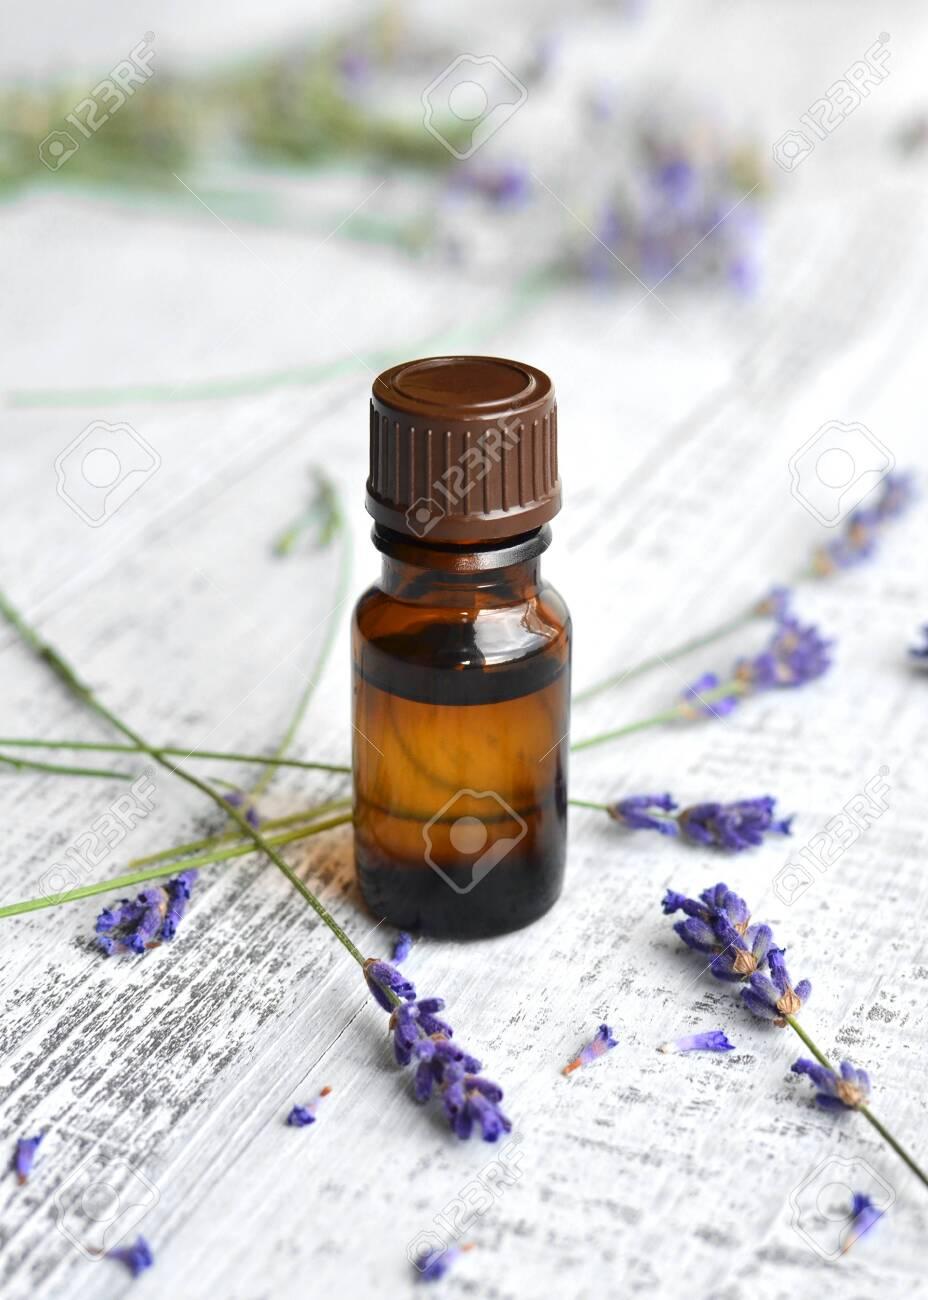 Organic herbal oil in dark glass bottle and fresh lavender flowers on light old wooden table background - 137163483